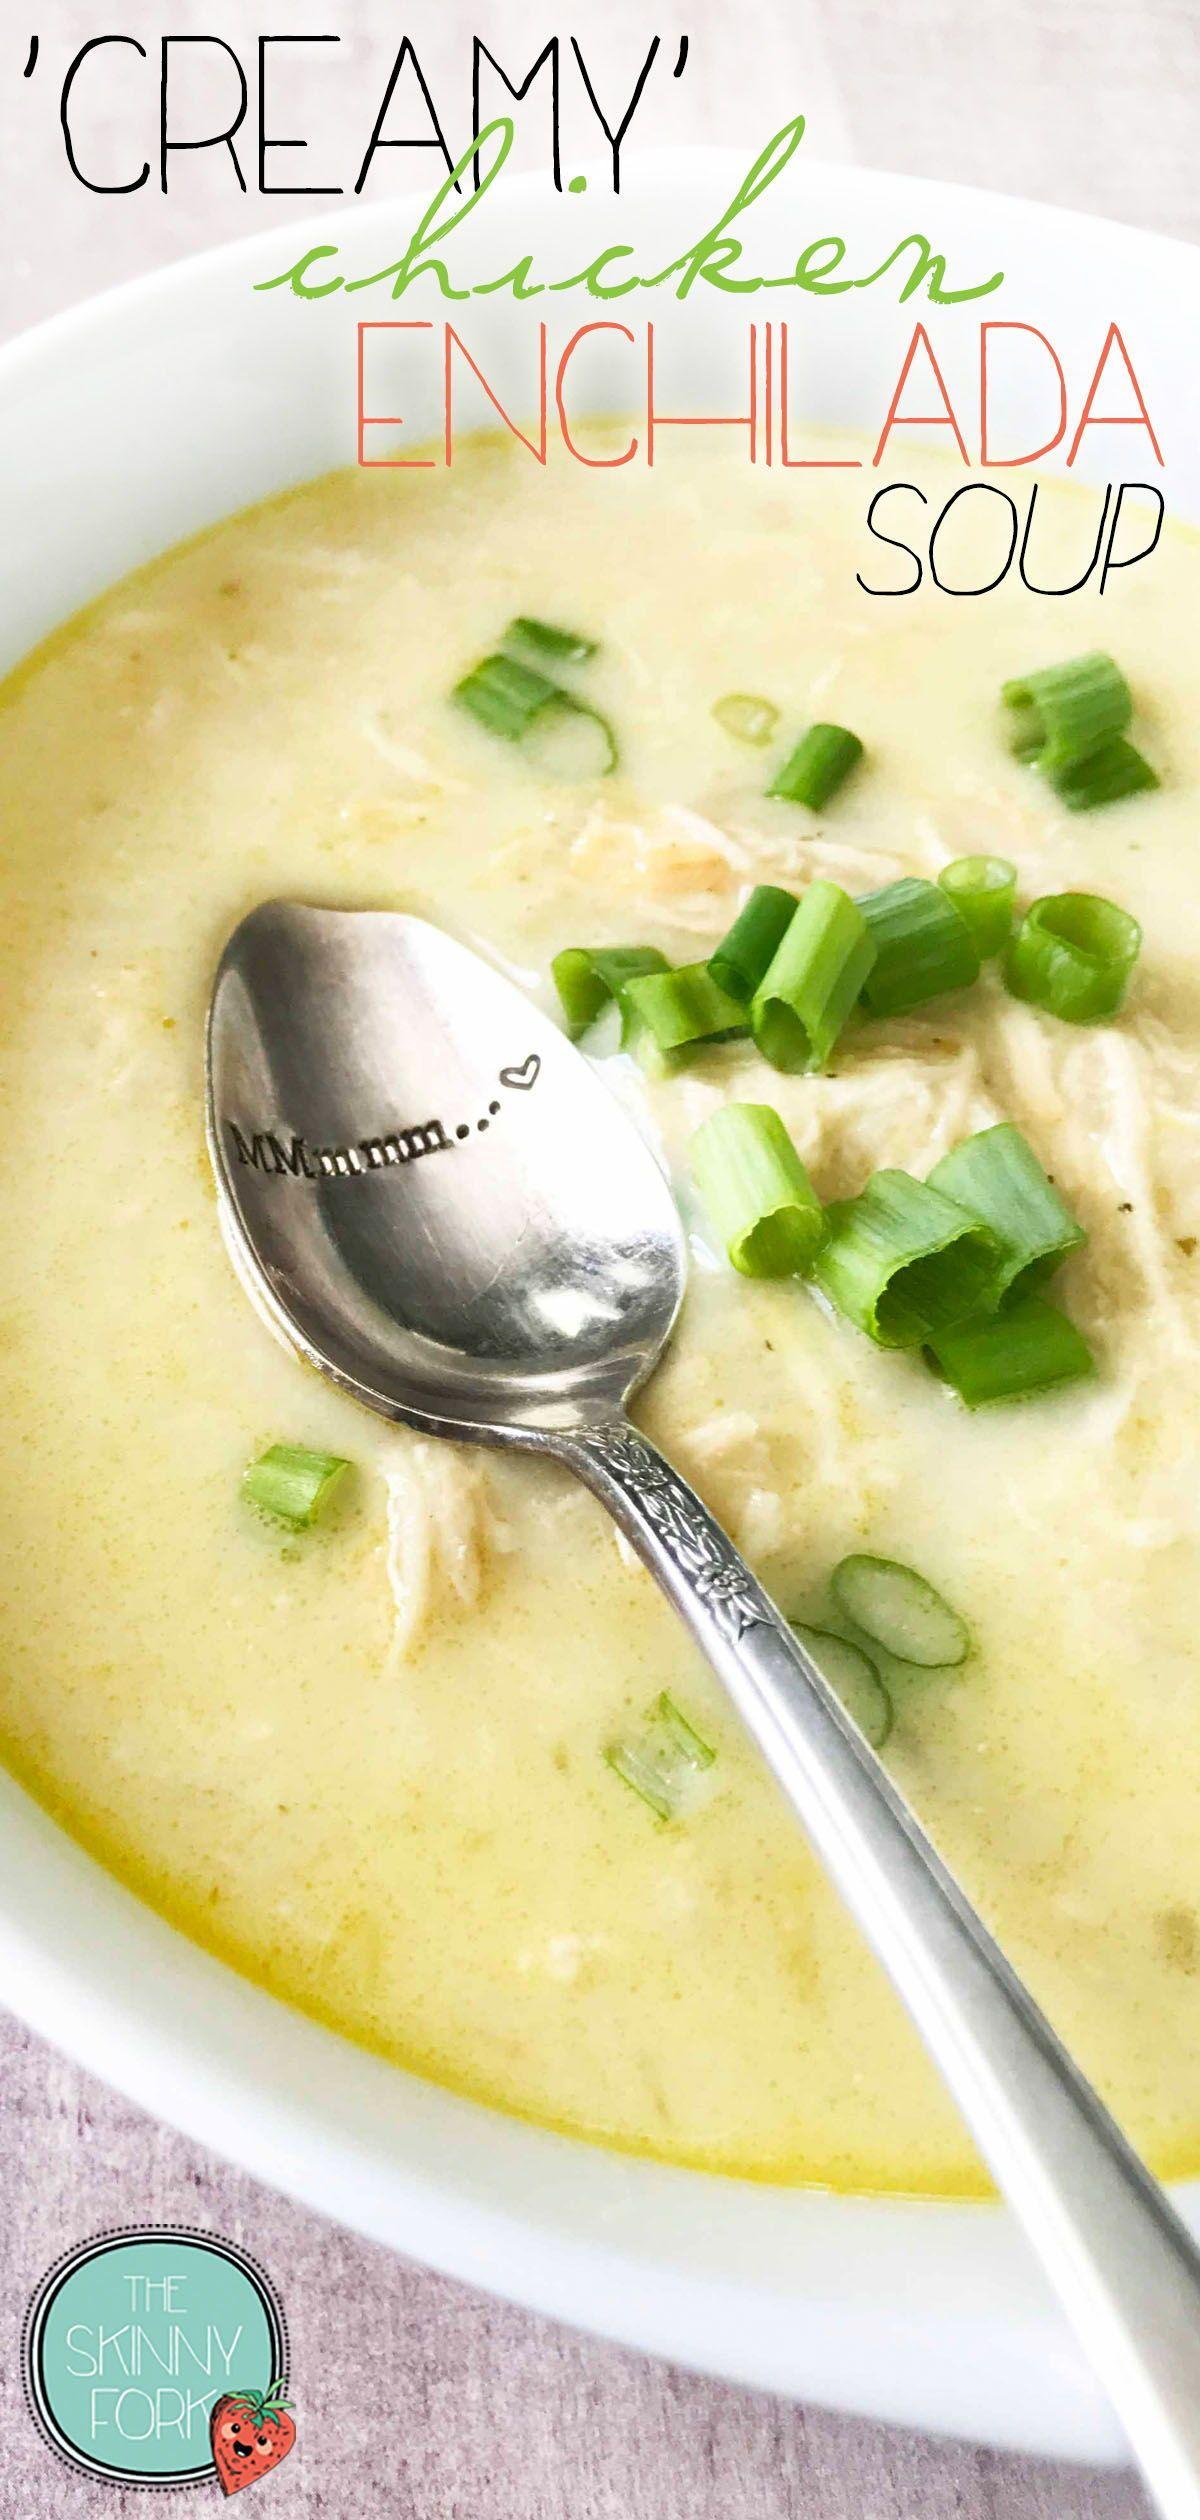 Creamy Chicken Enchilada Soup Instant Pot The Skinny Fork Recipe In 2020 Enchilada Soup Chicken Enchilada Soup Creamy Chicken Enchiladas